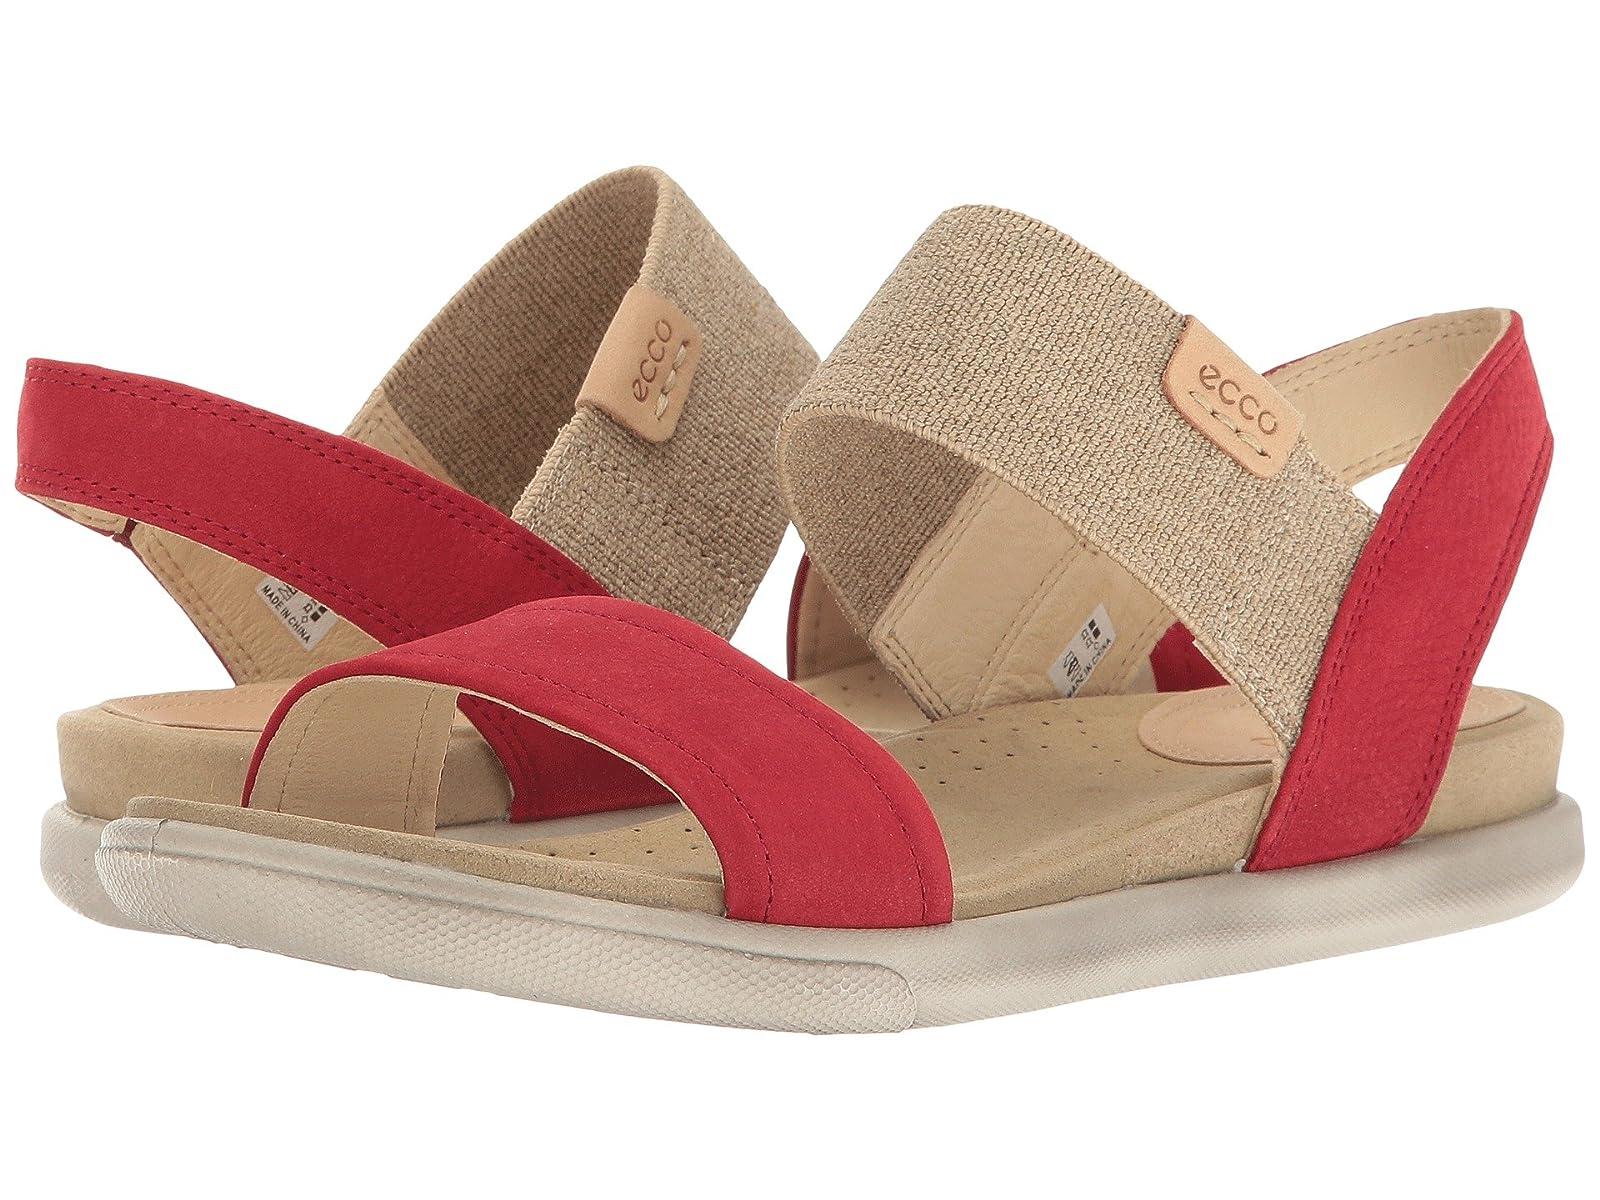 ECCO Damara Ankle SandalComfortable and distinctive shoes